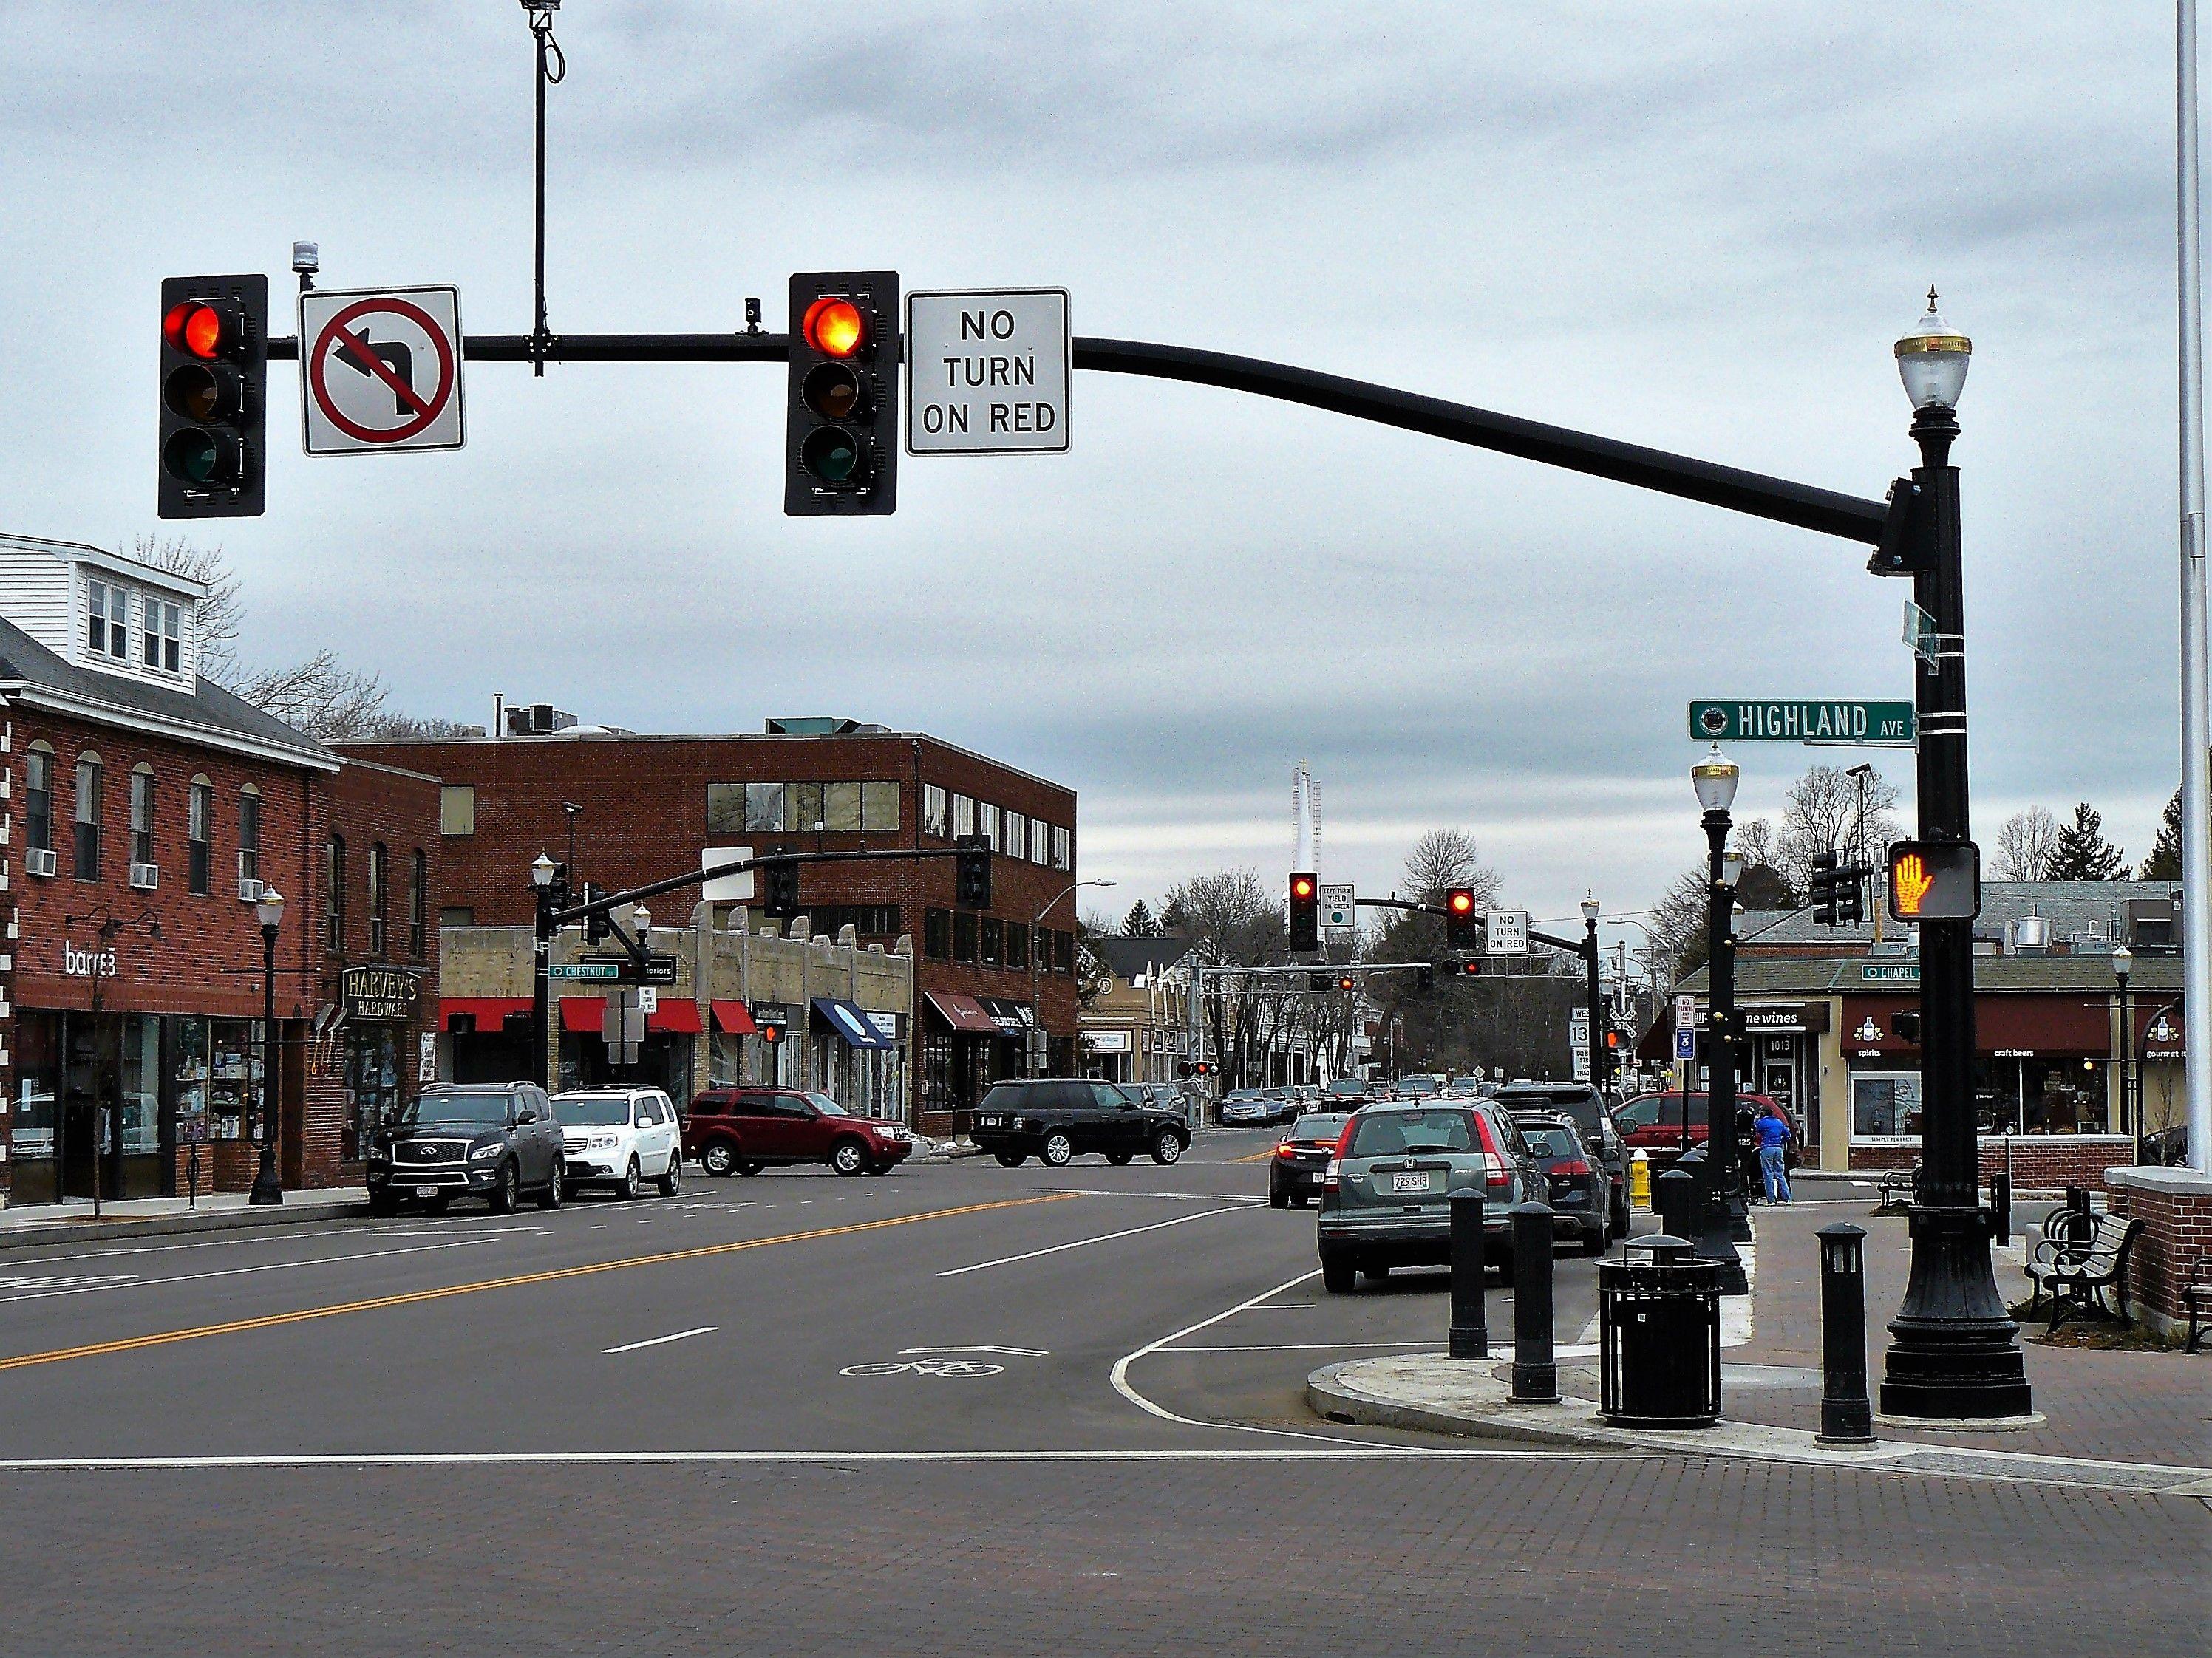 Nyc Lampposts Lamp Post Nyc Traffic Light